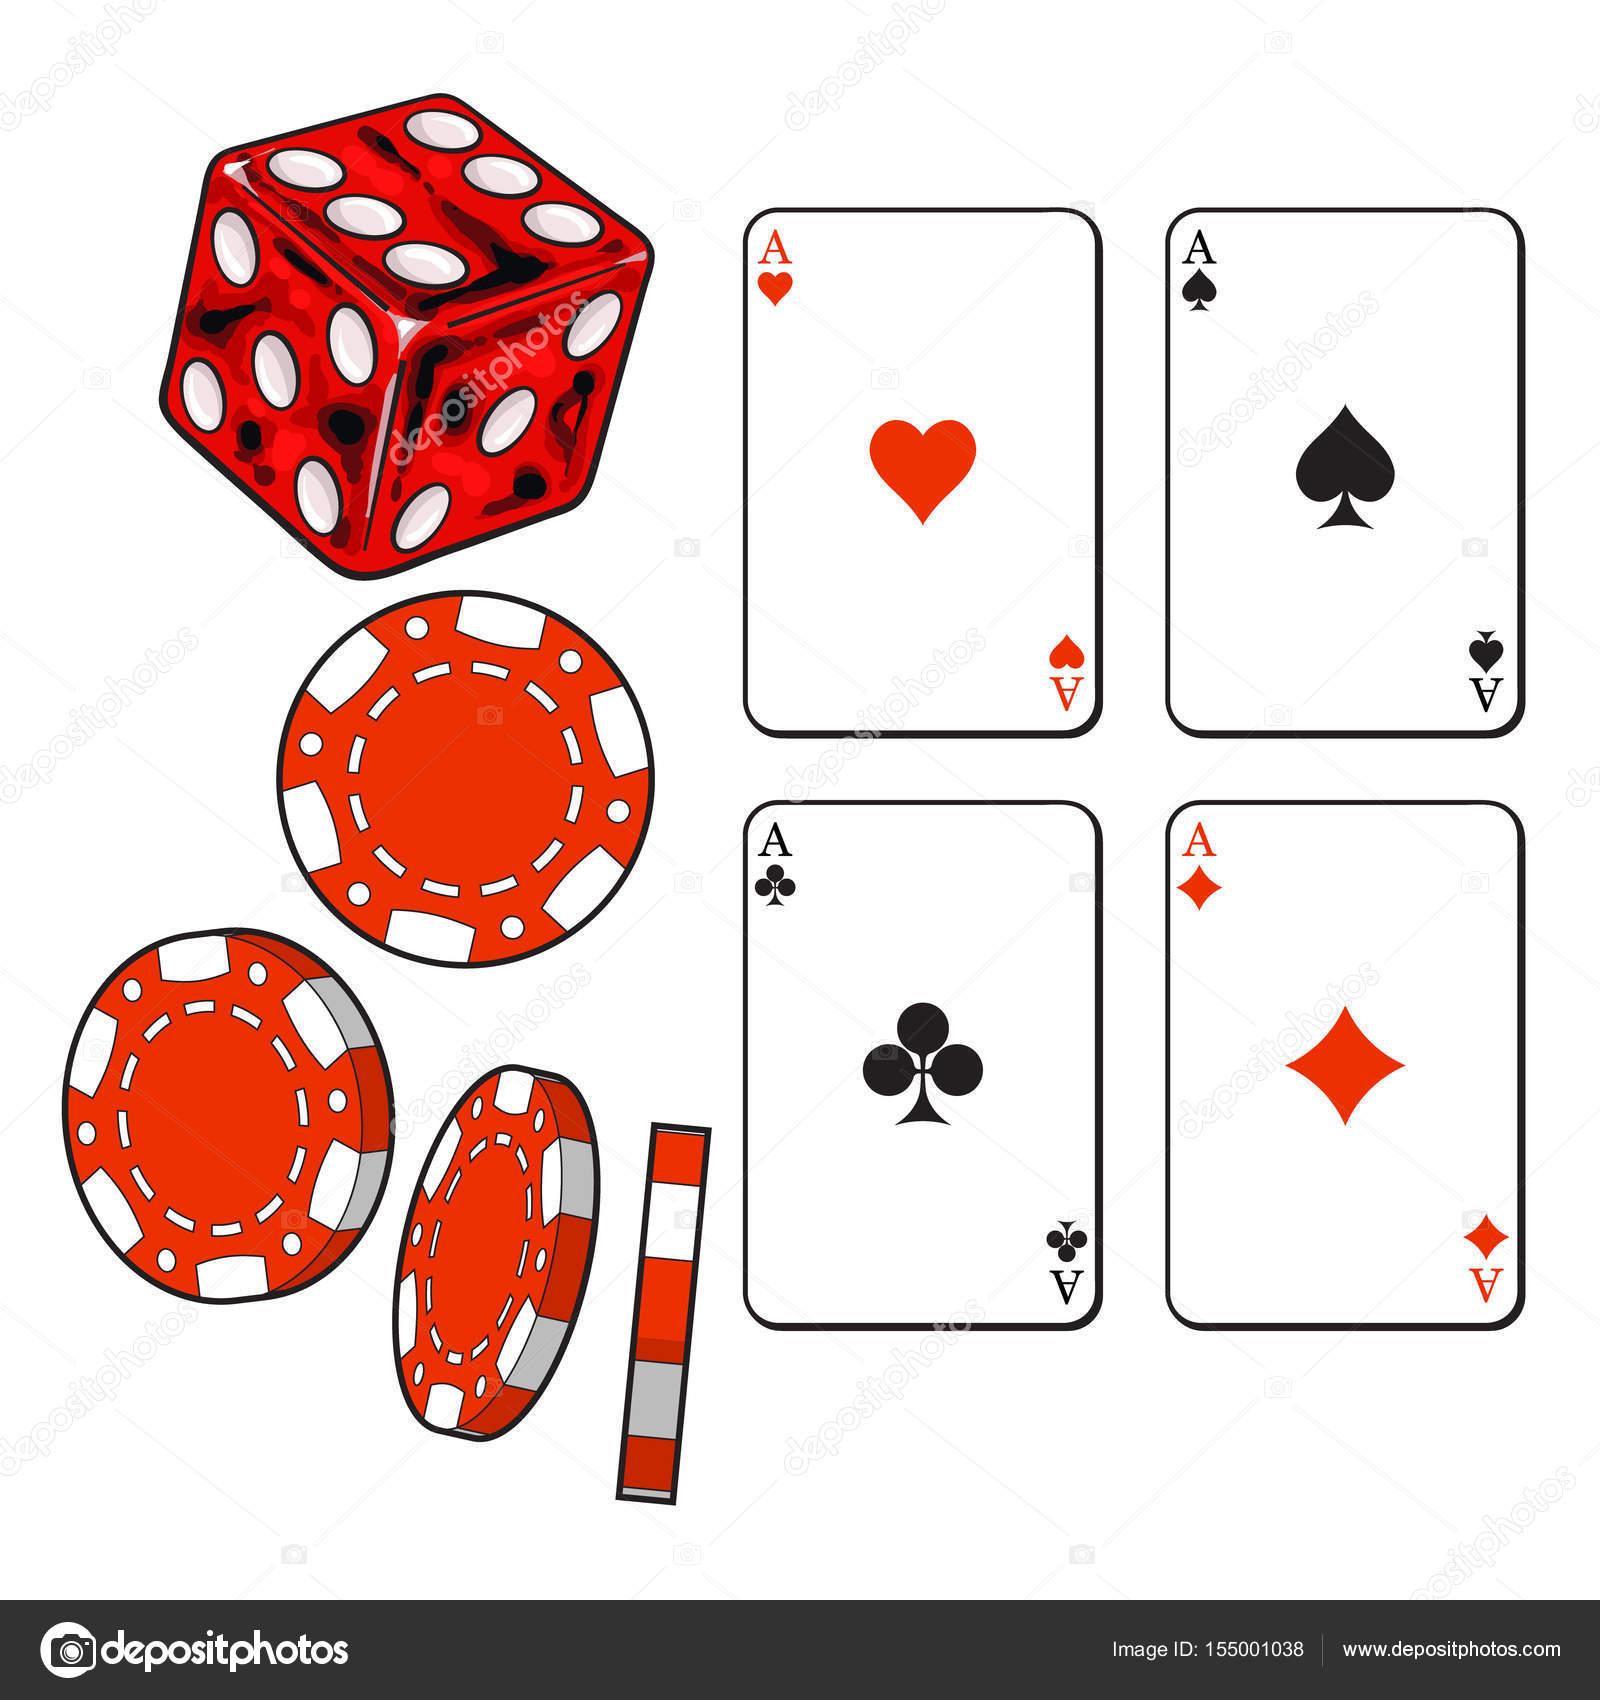 Best poker game ios